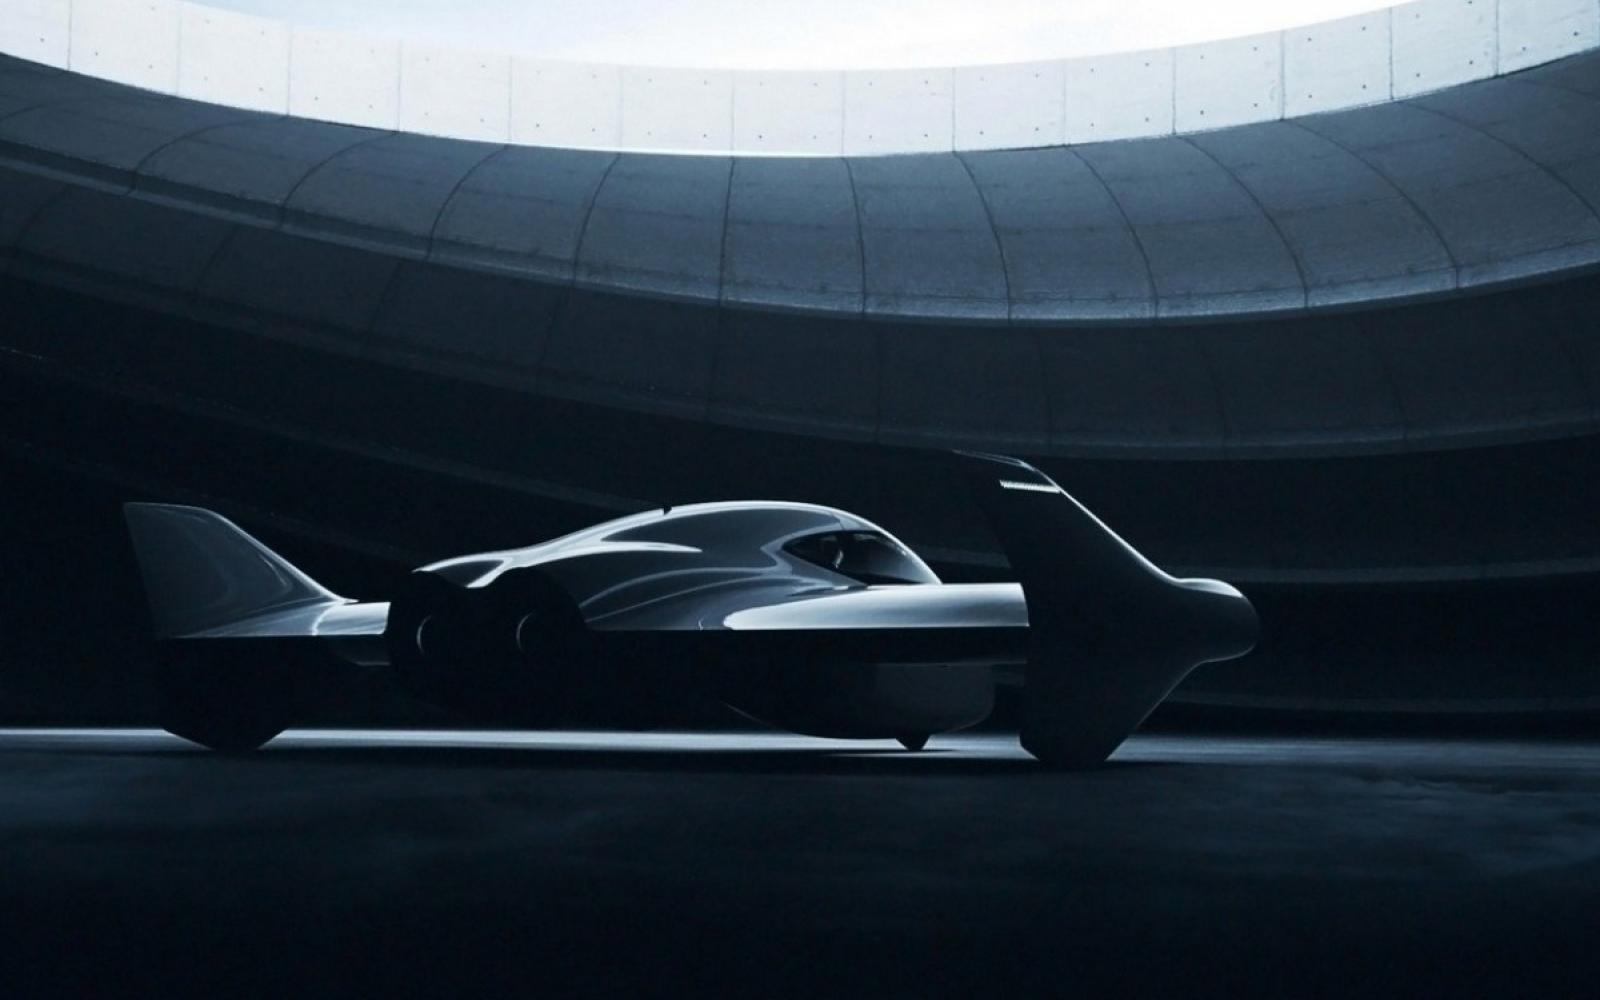 Porsche en Boeing ontwikkelen vliegende auto